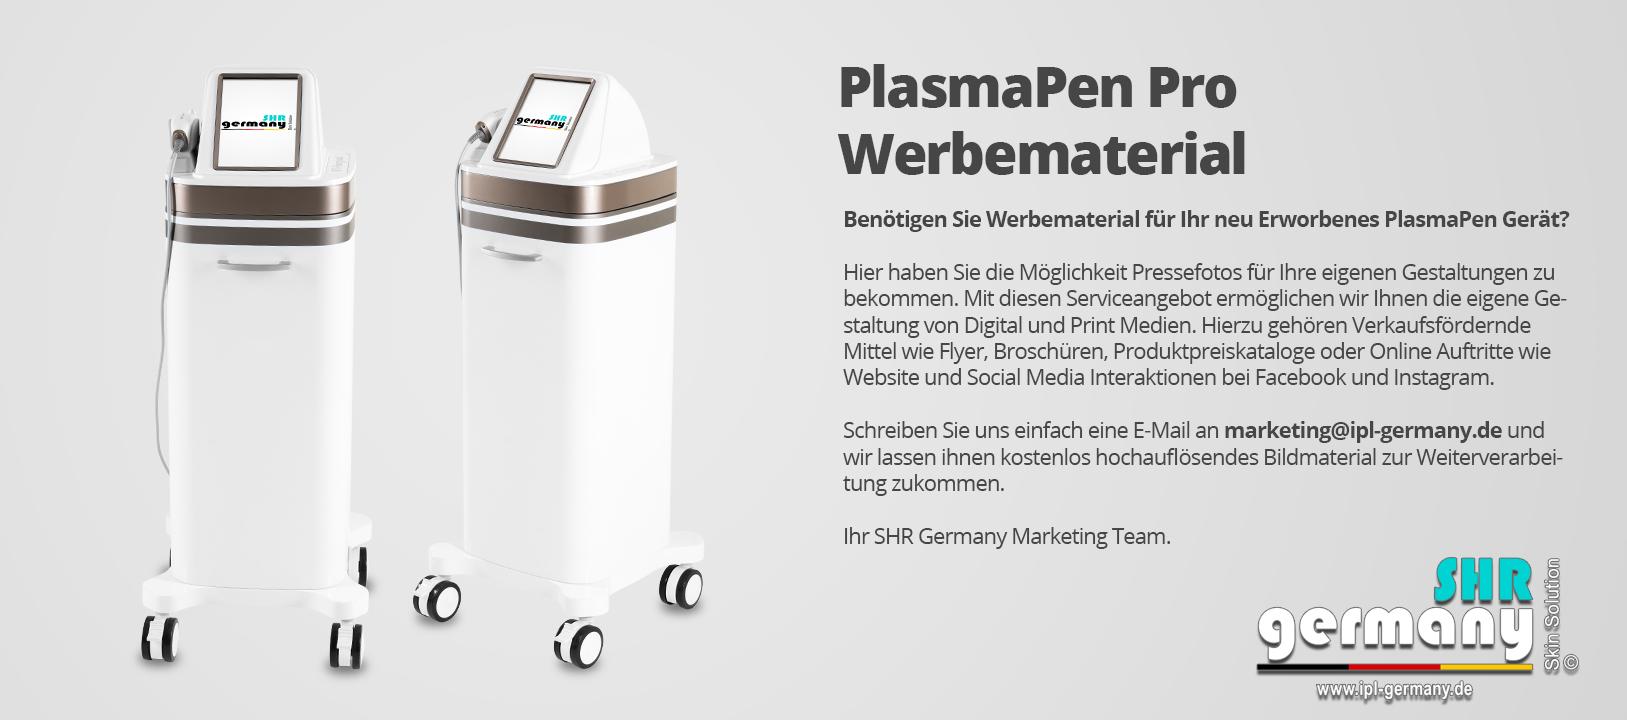 SHR-Germany_PlasmaPenPro_Werbematerial